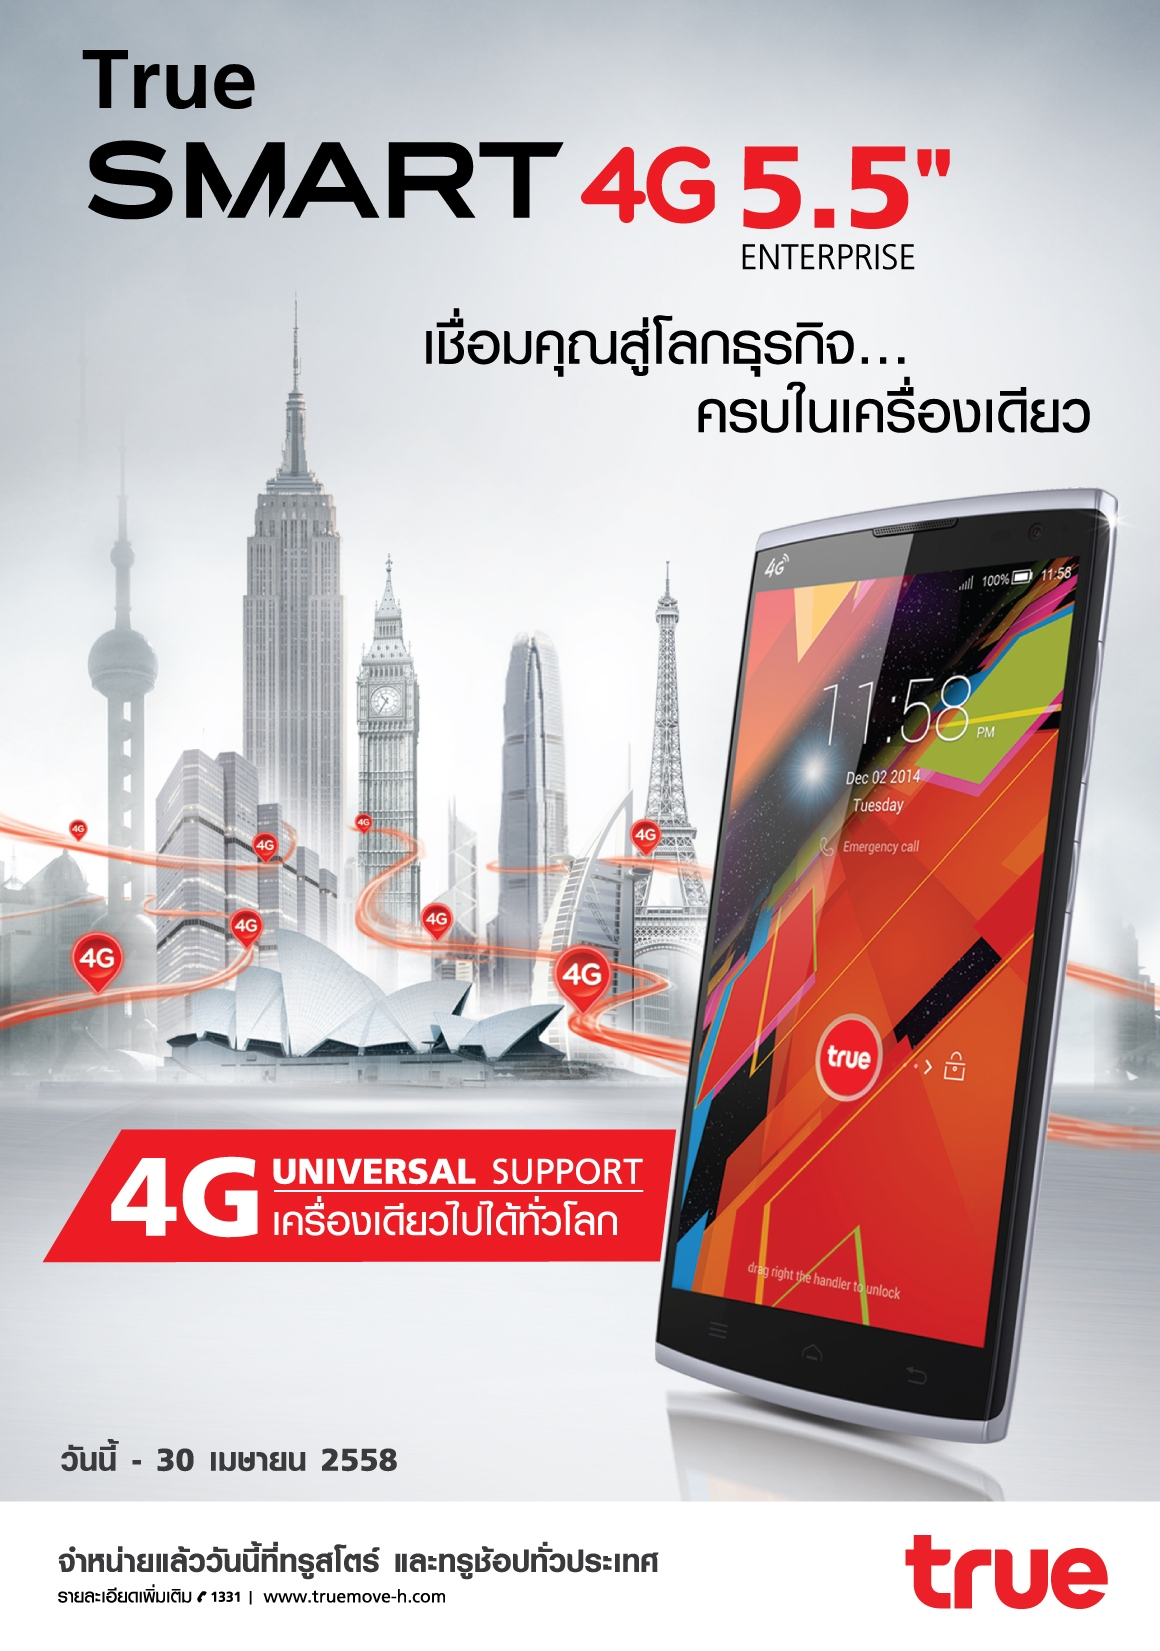 New product_True Smart 4G 5.5 Enterprise_03